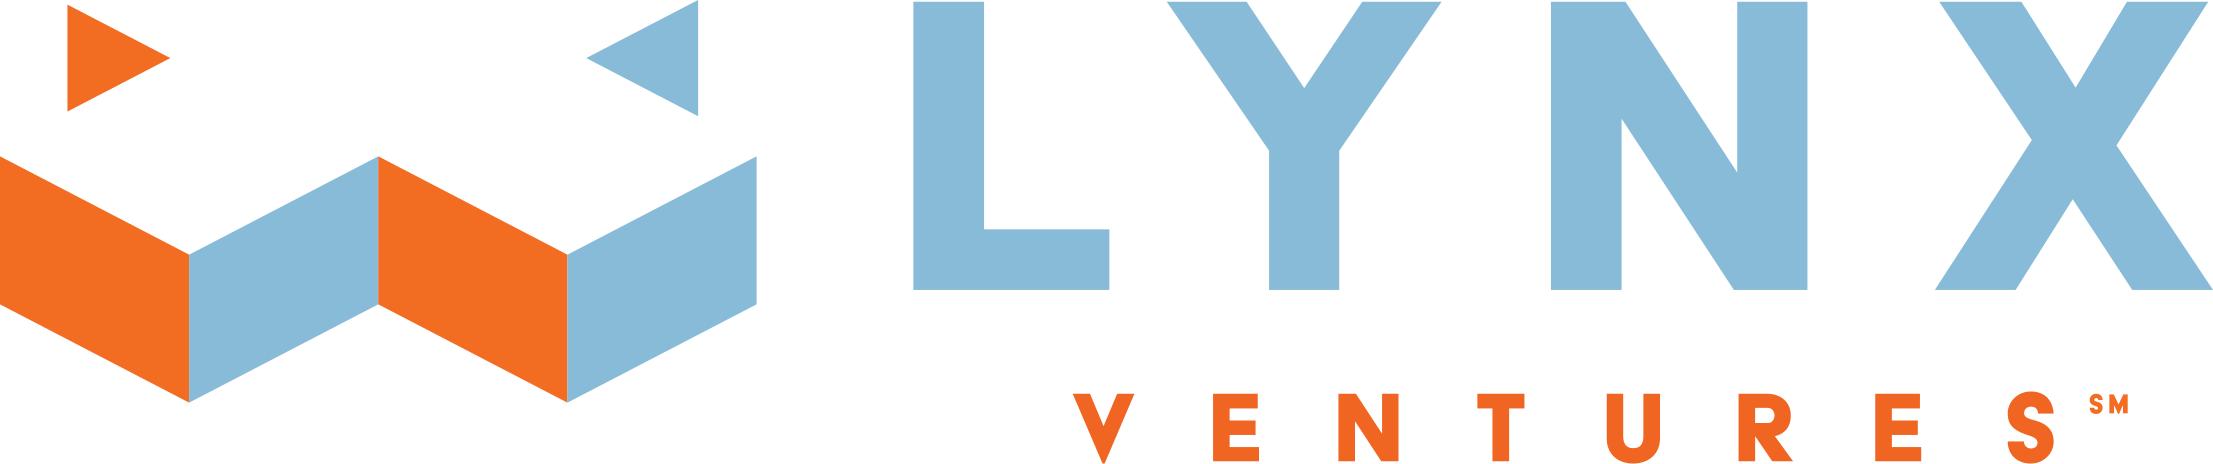 Lynx-Horizonal.png